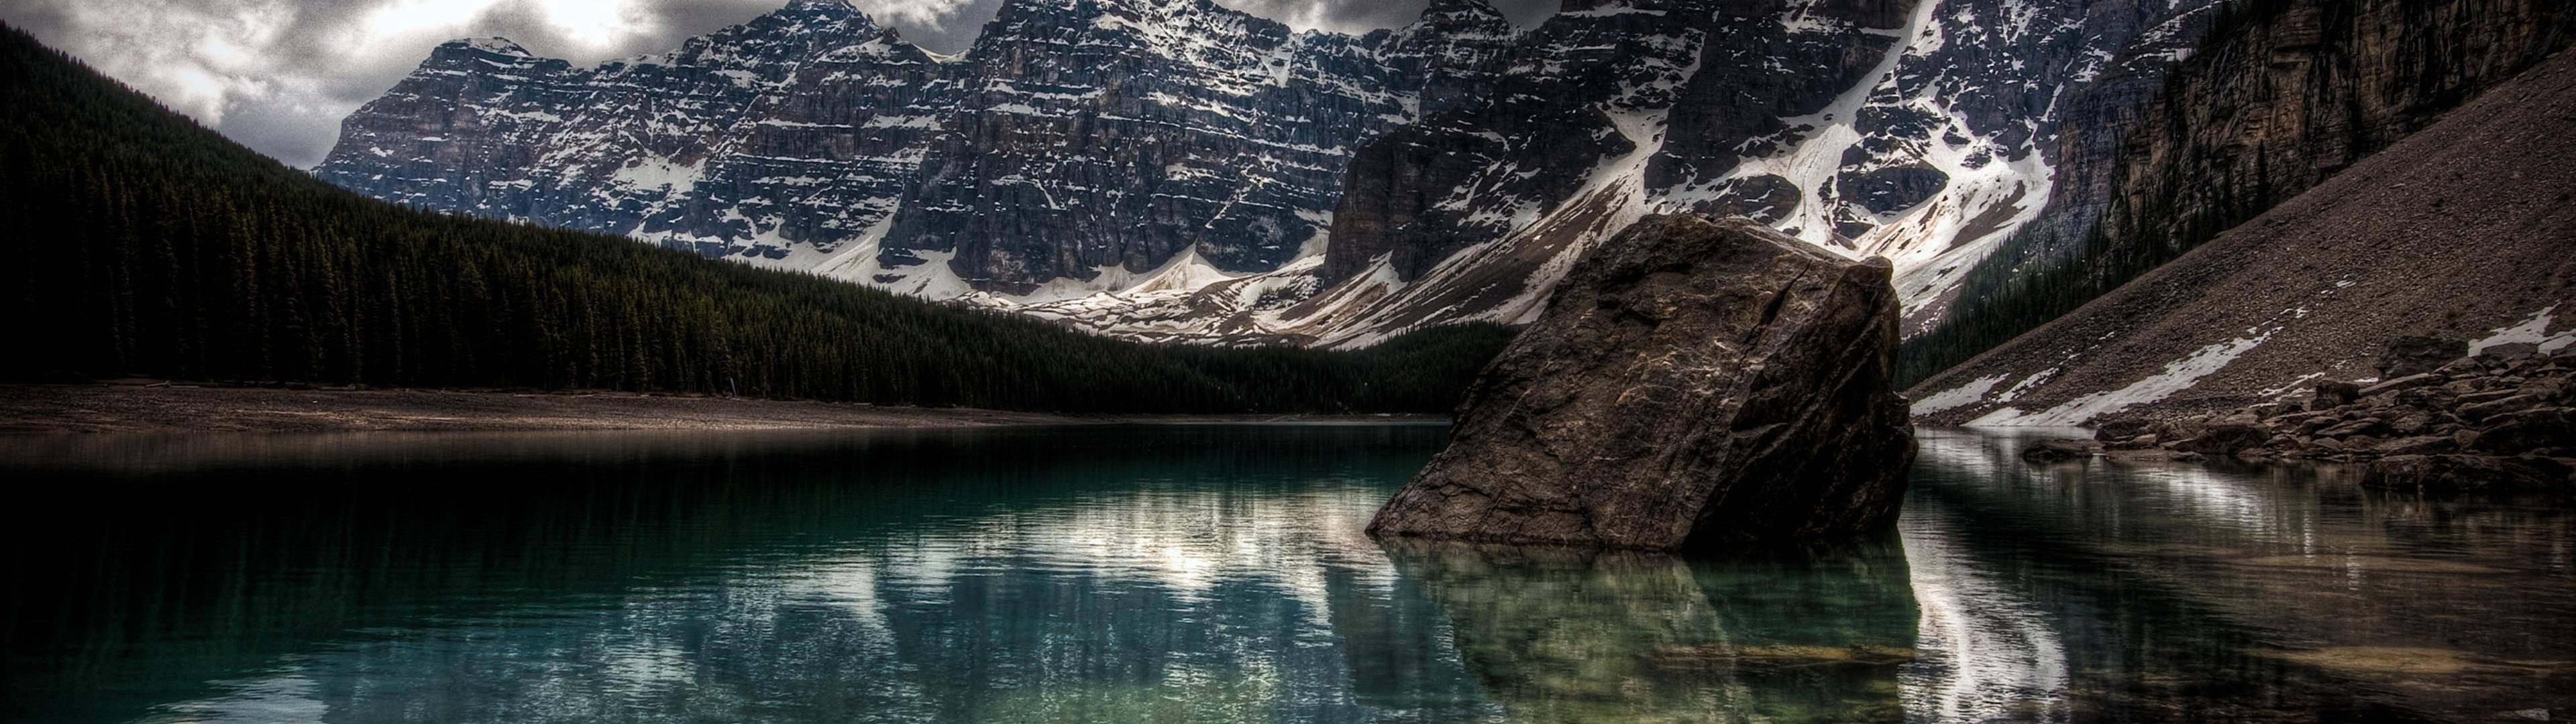 Wallpaper 3840x1080 Px Canada Lake Moraine Lake Mountain Nature 3840x1080 Wallhaven 1092536 Hd Wallpapers Wallhere